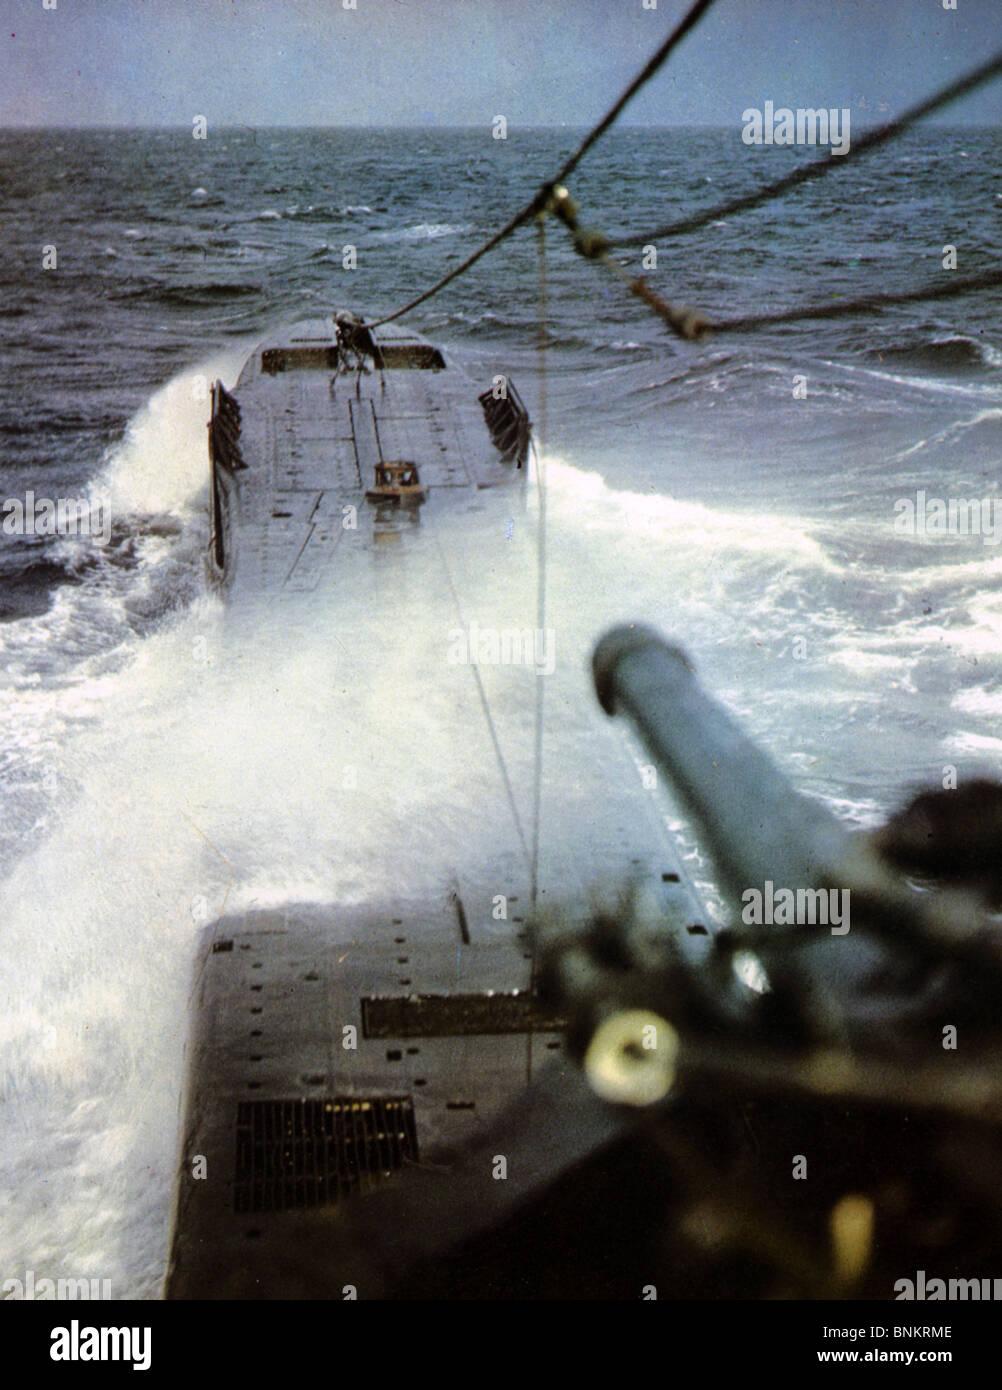 hight resolution of u boat german u boat at sea during ww2 stock image